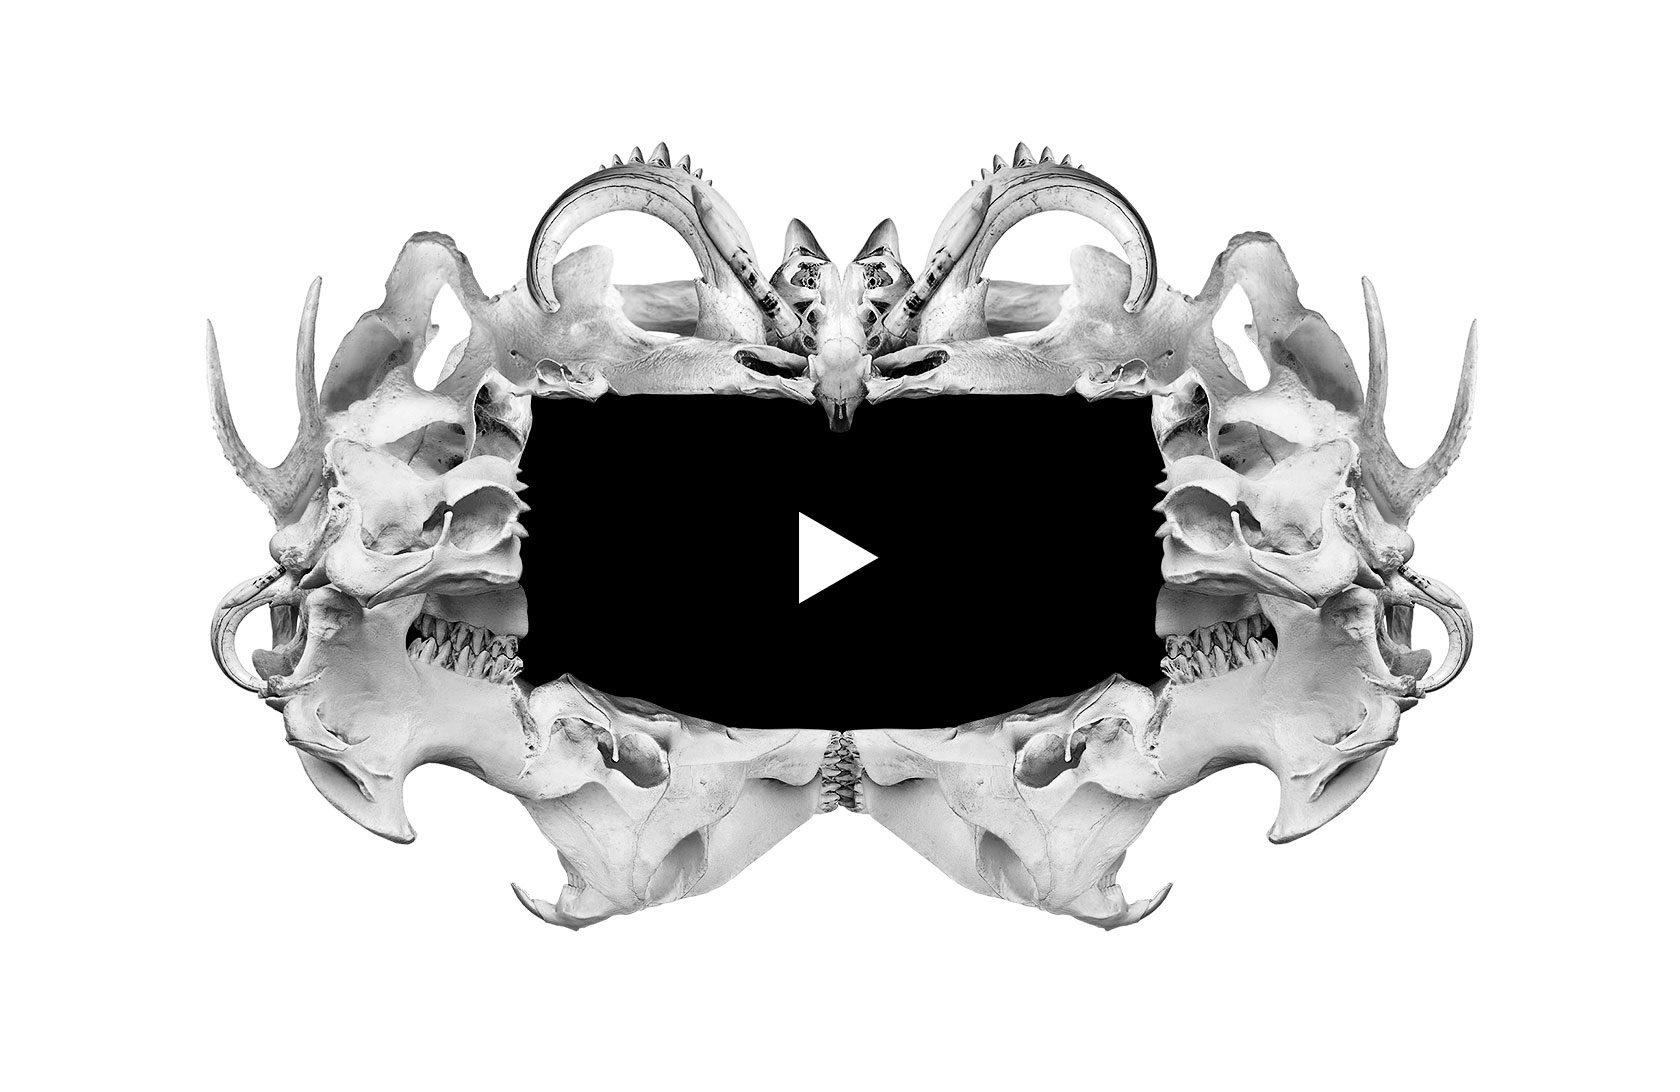 The Visual Medium Media Player Bone Design by Furia